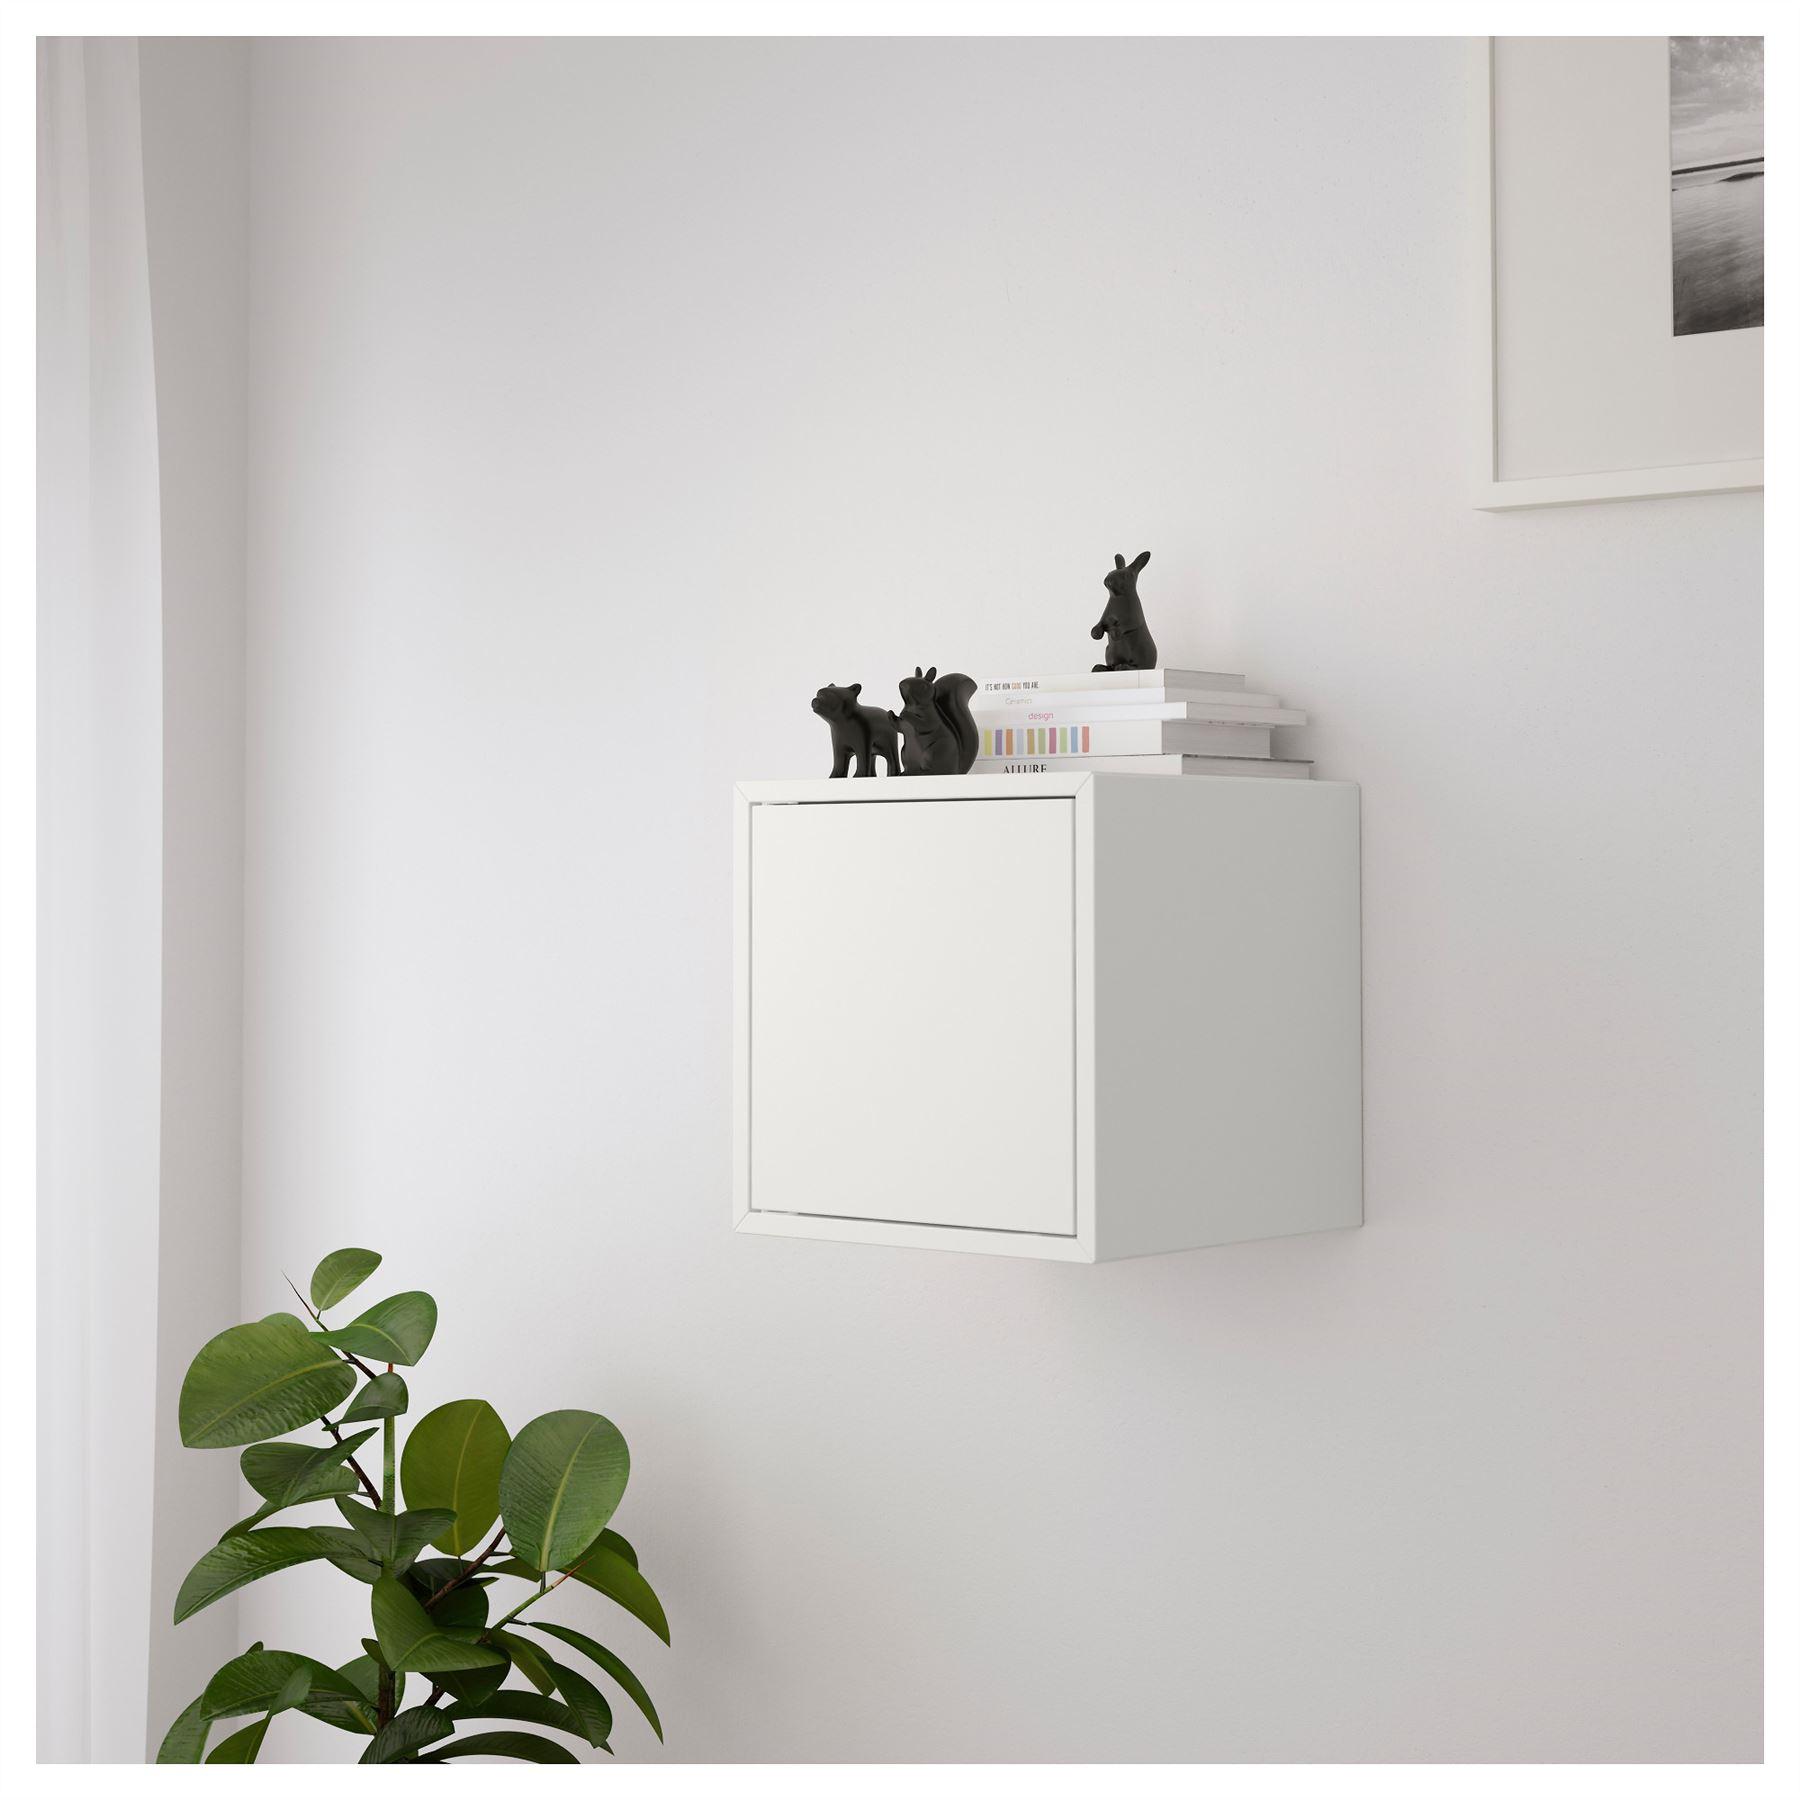 2x Ikea Eket Cabinet With Door Display Shelving Unit White